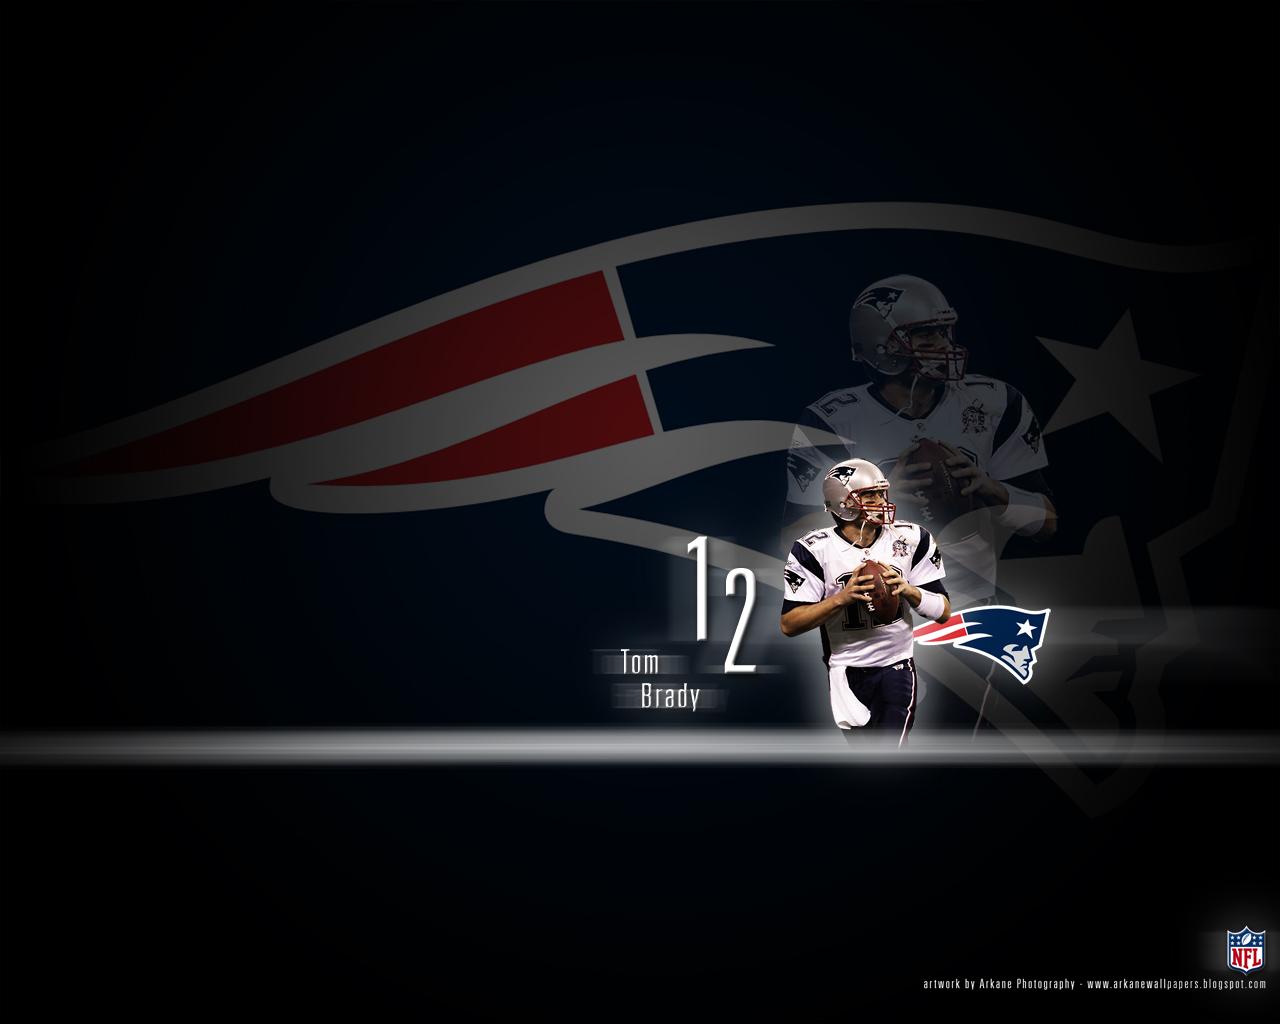 http://2.bp.blogspot.com/_JuYYGgmnUQU/SwP7t-9lcbI/AAAAAAAAAXY/iu2uSoIkdnw/s1600/12+Tom+Brady+-+Patriots.jpeg